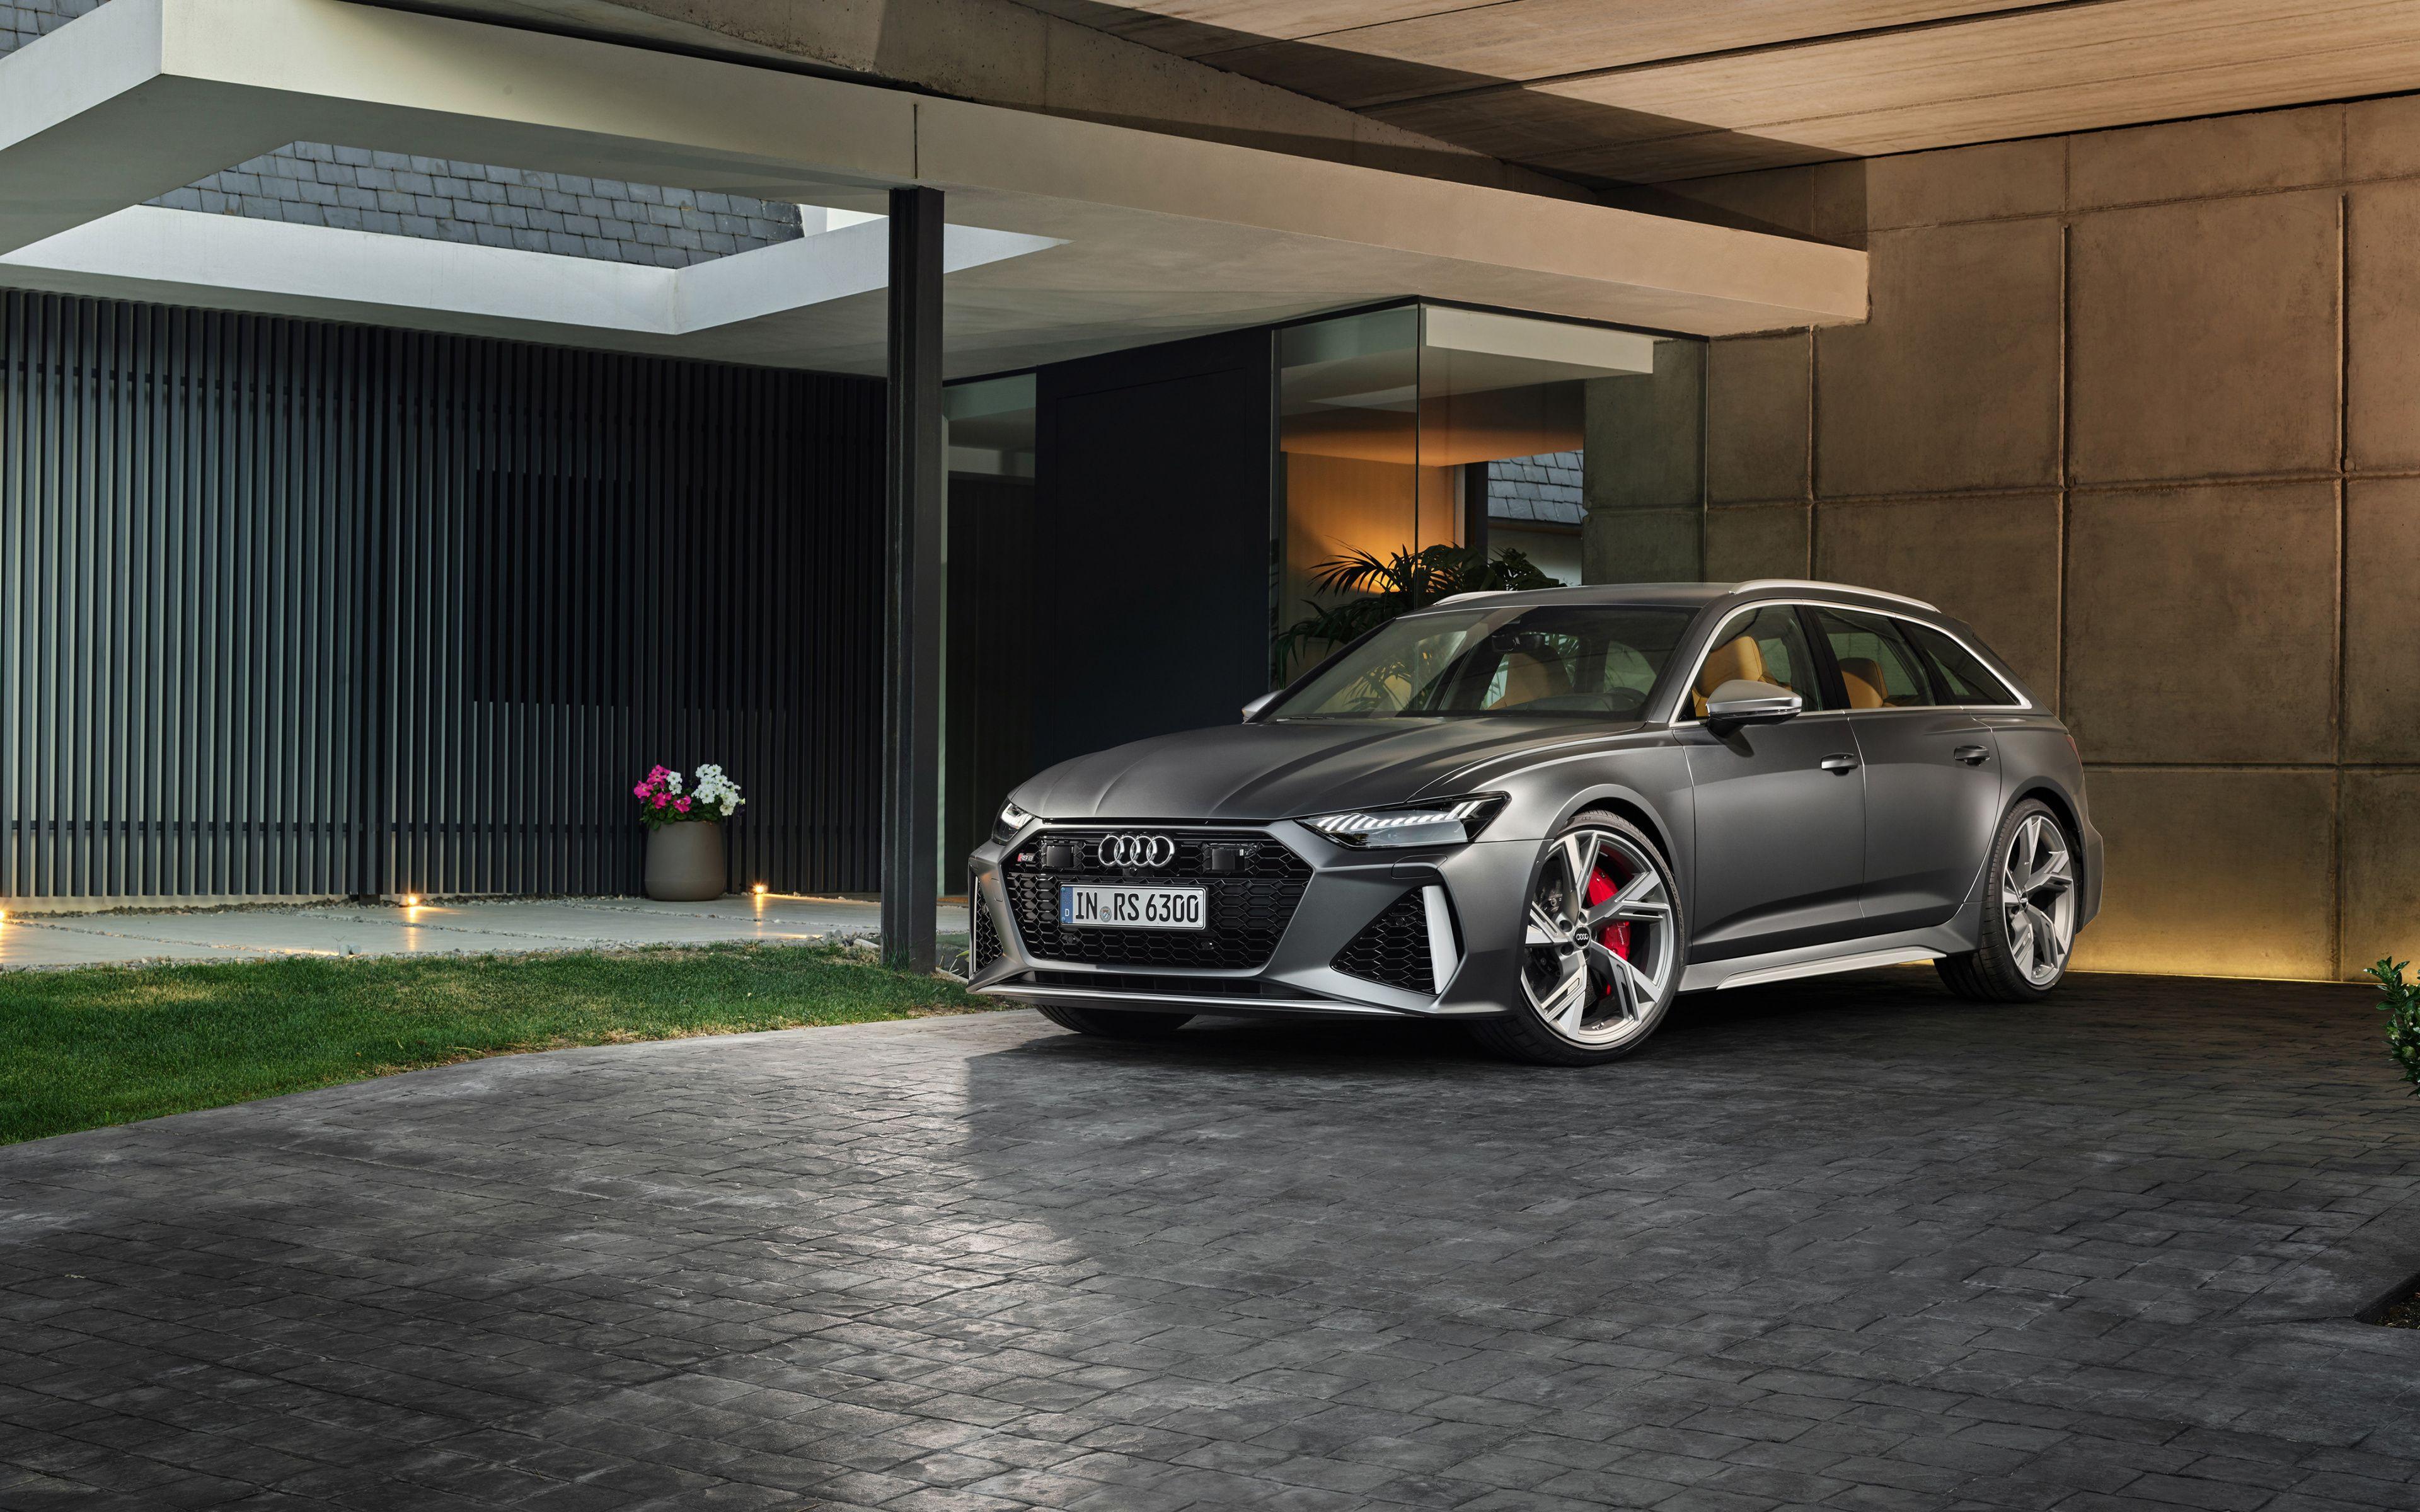 3840x2400 Audi Rs6 Avant 2019 Car Wallpaper Audi Rs6 Audi Rs Audi